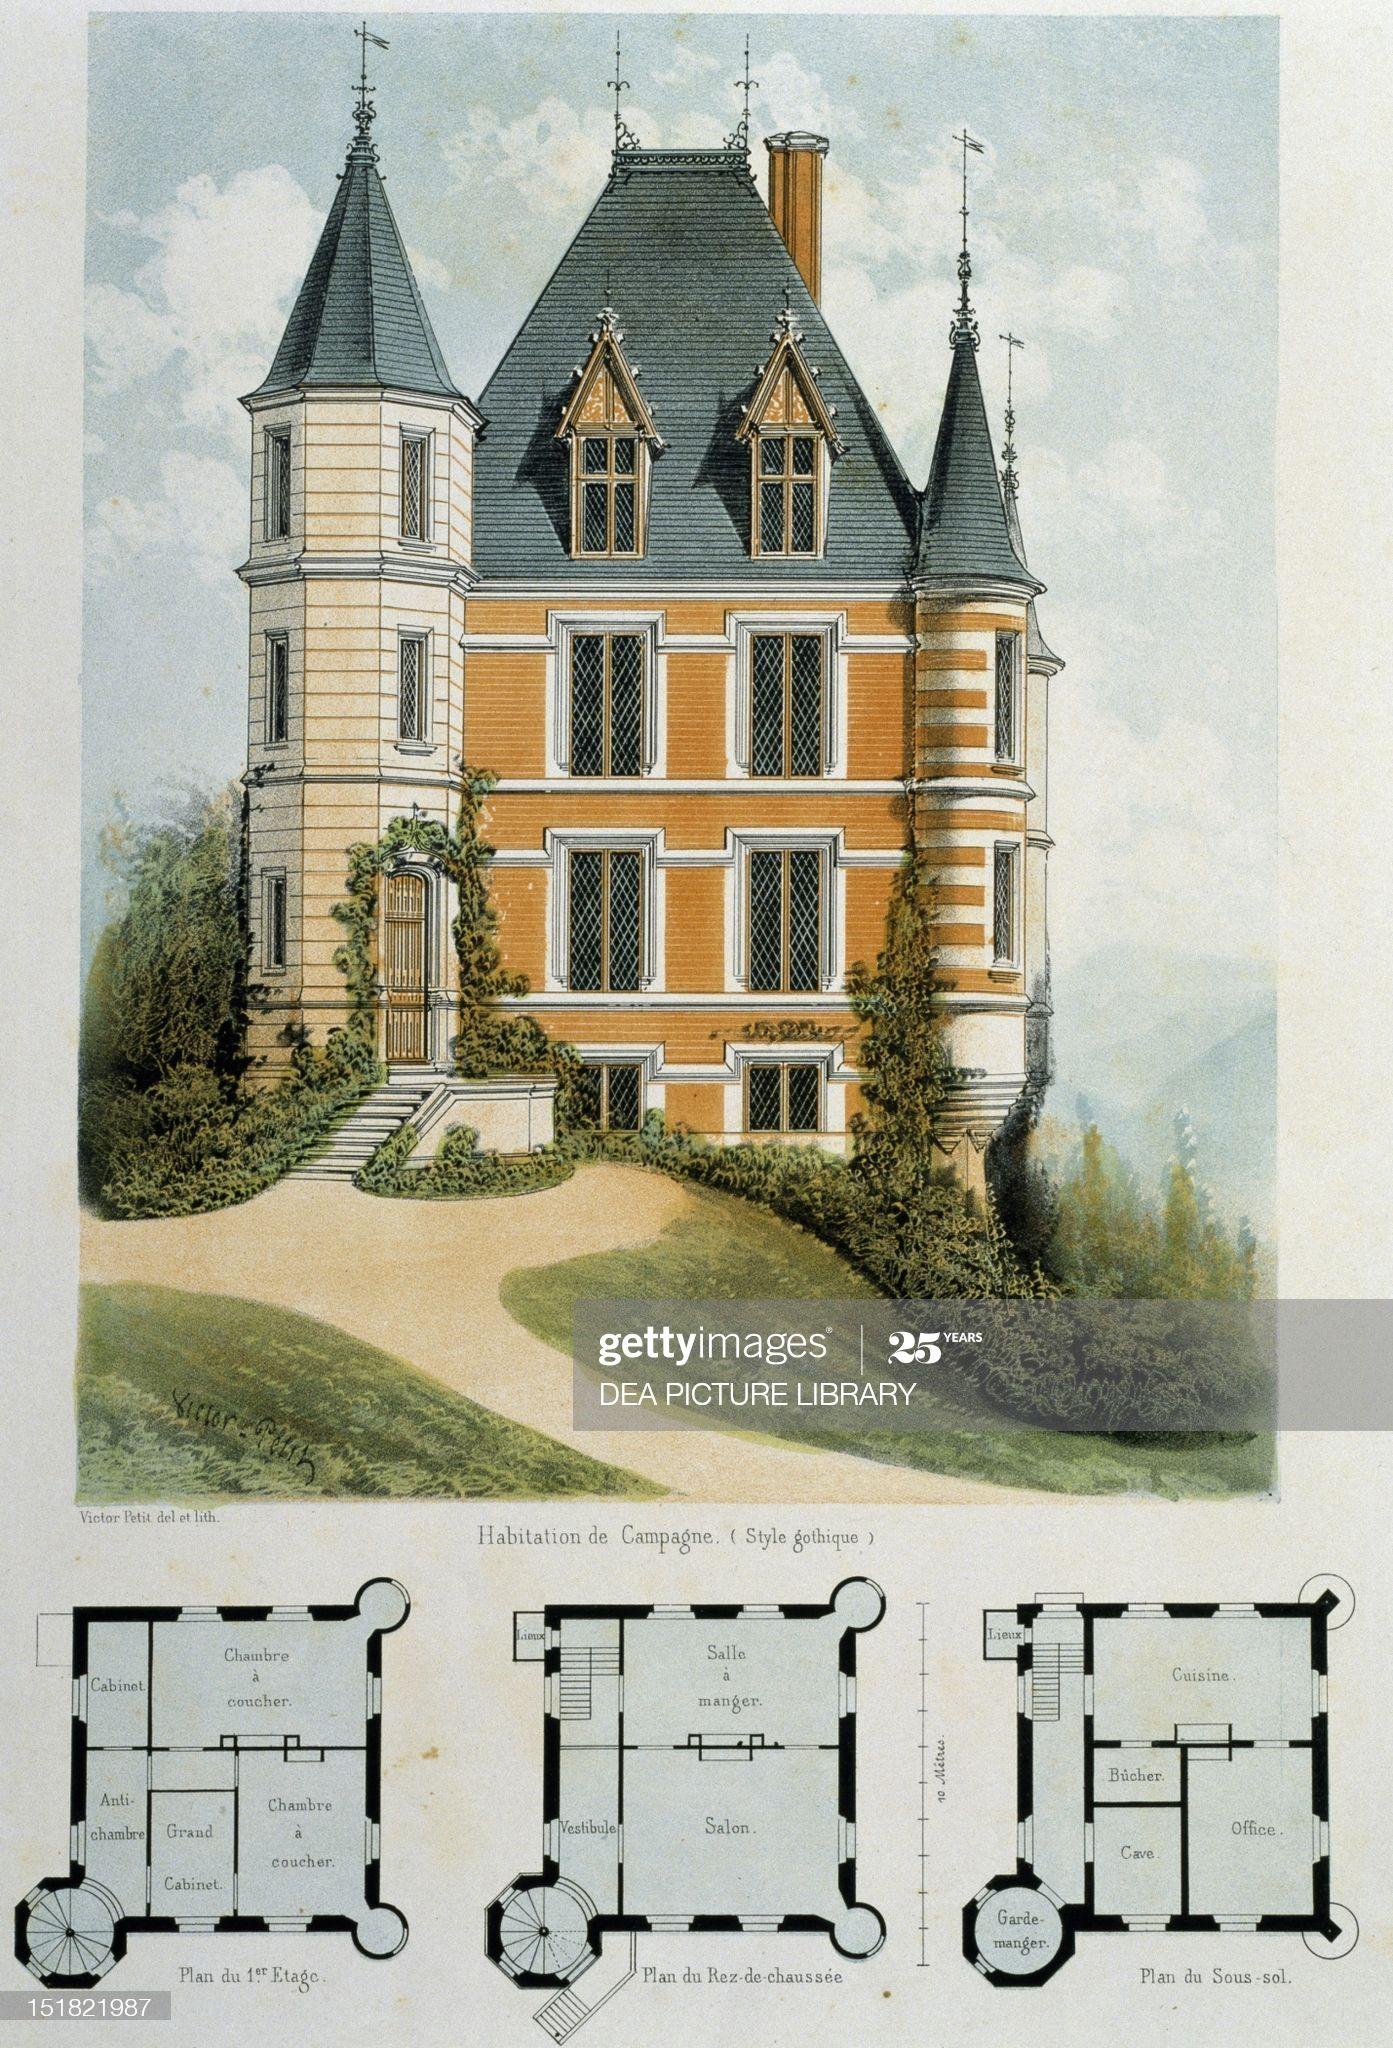 Fine Art Gothic Style Country House Lithograph Taken From Parcs Et Jardins Des Environs De Paris By V Victorian House Plans Gothic House Vintage House Plans